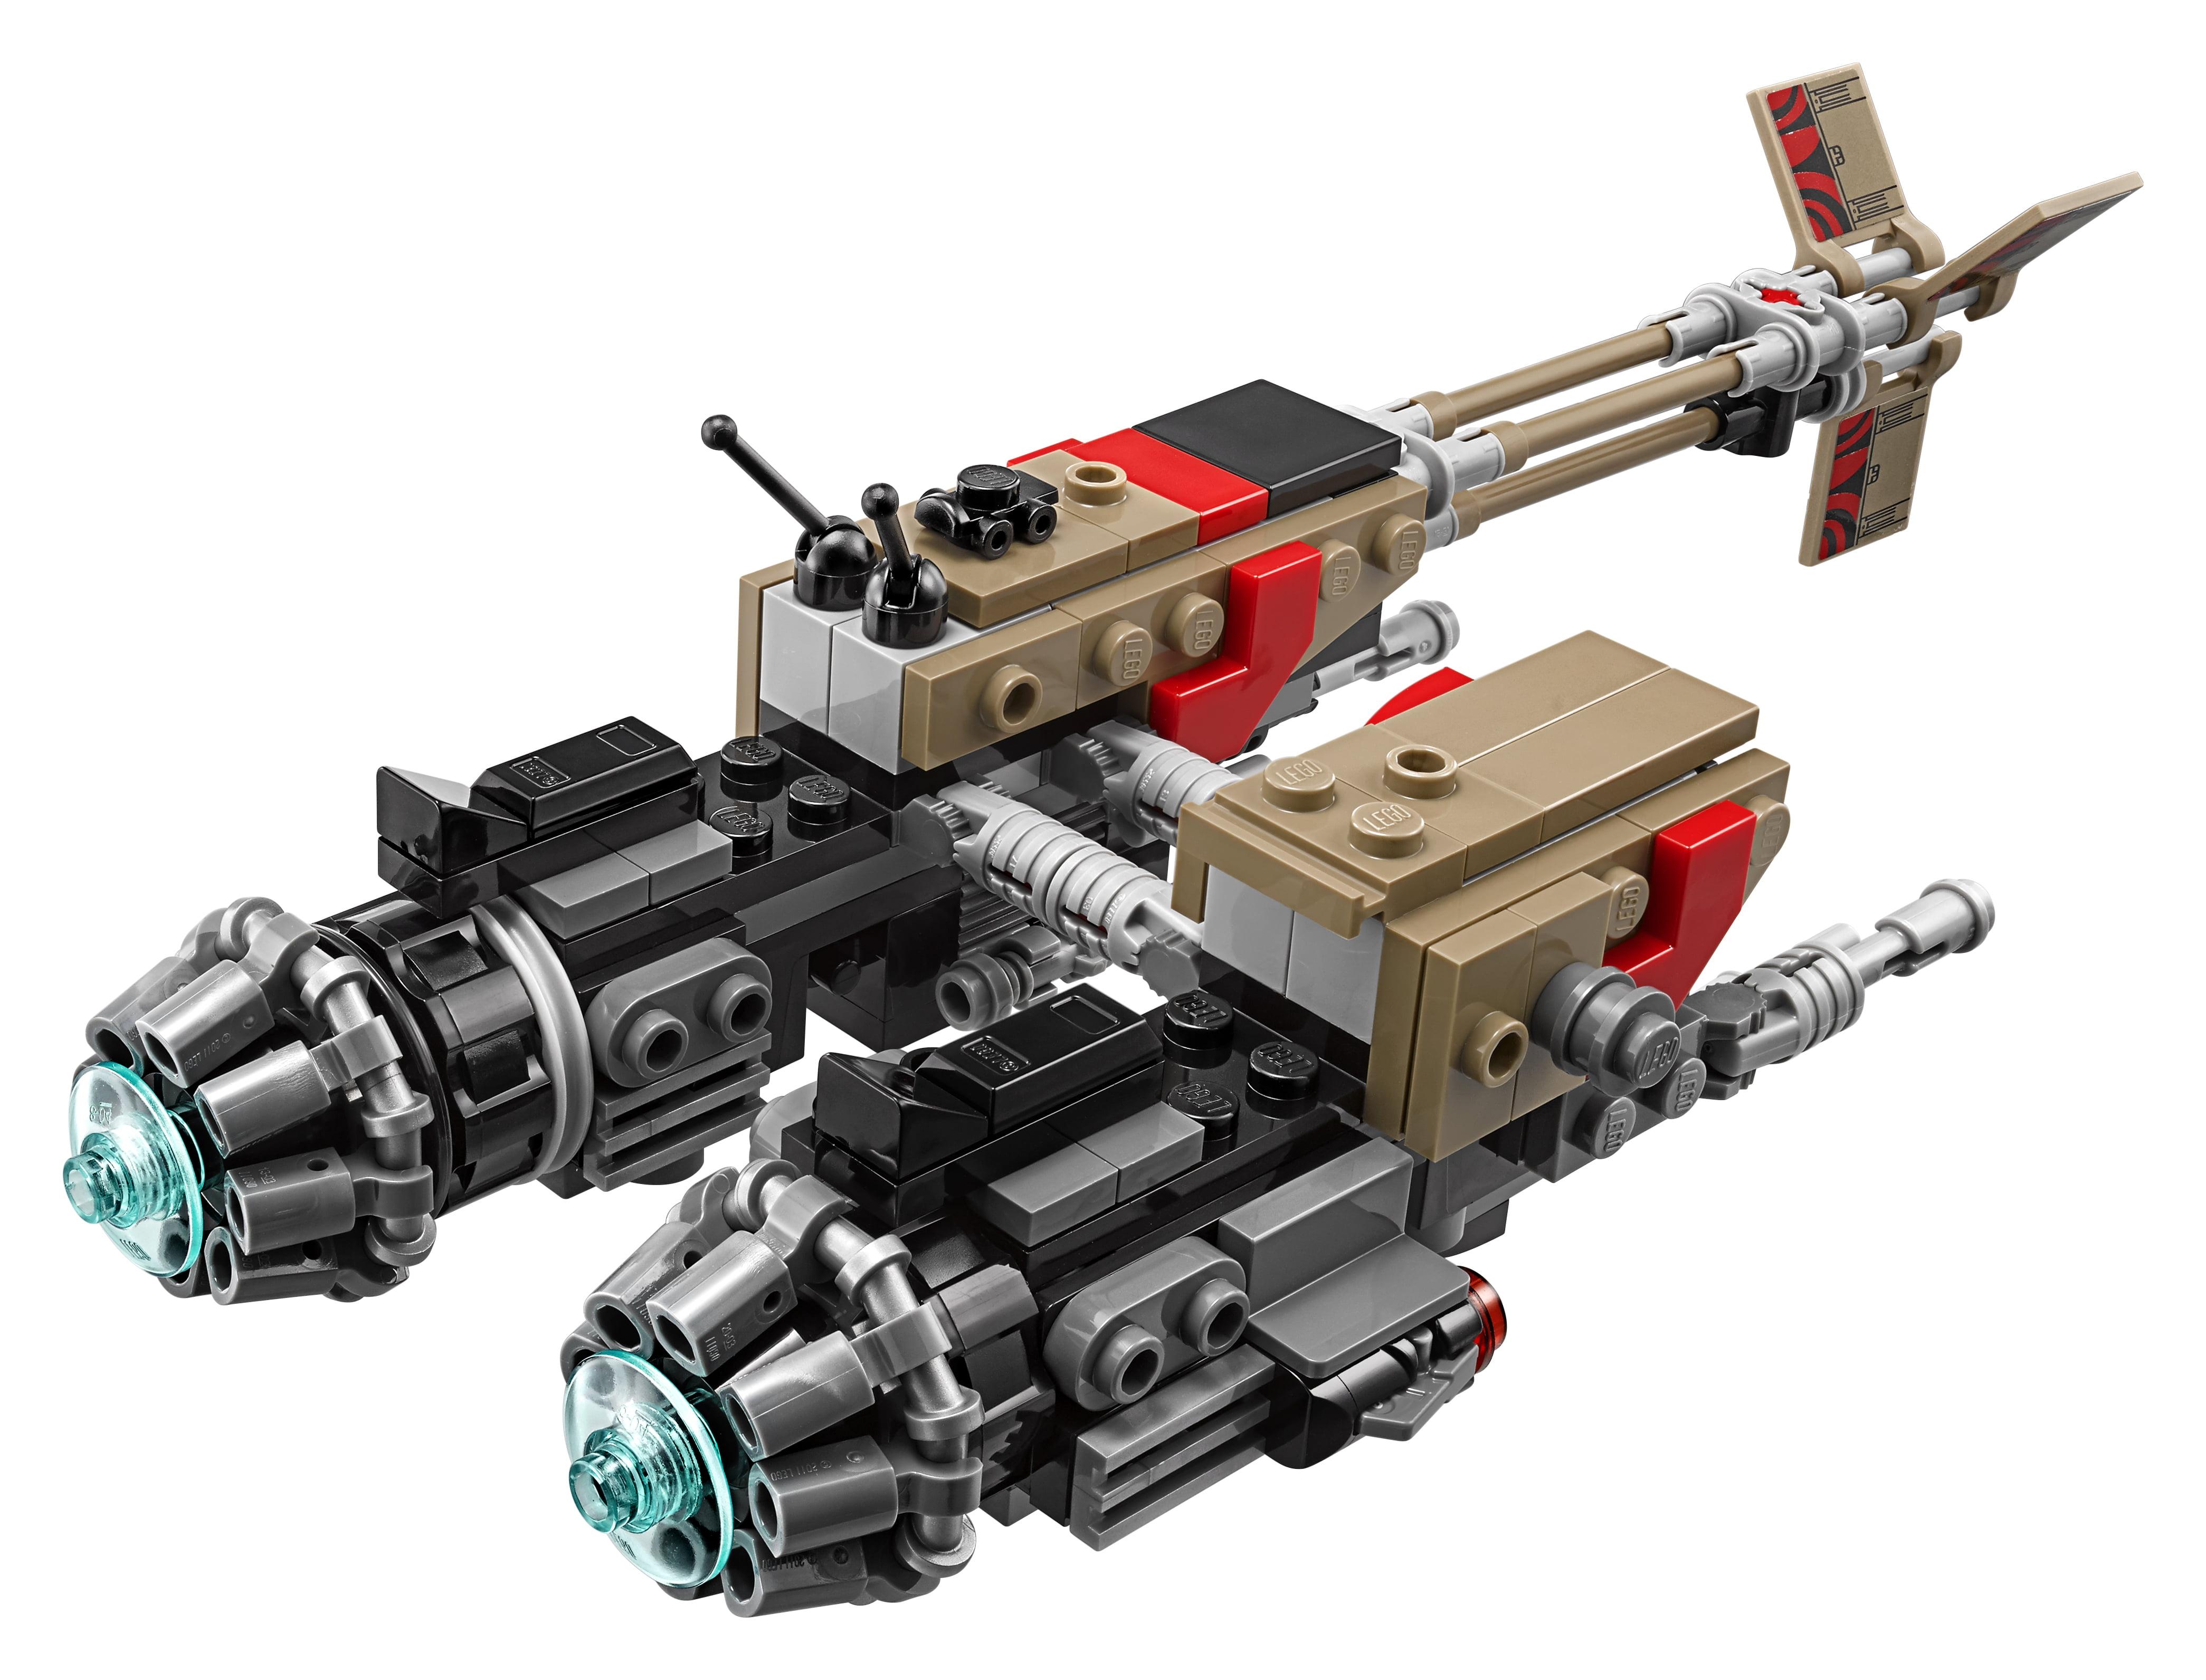 Lego Star Wars Cloud-Rider Swoop Bikes 75215